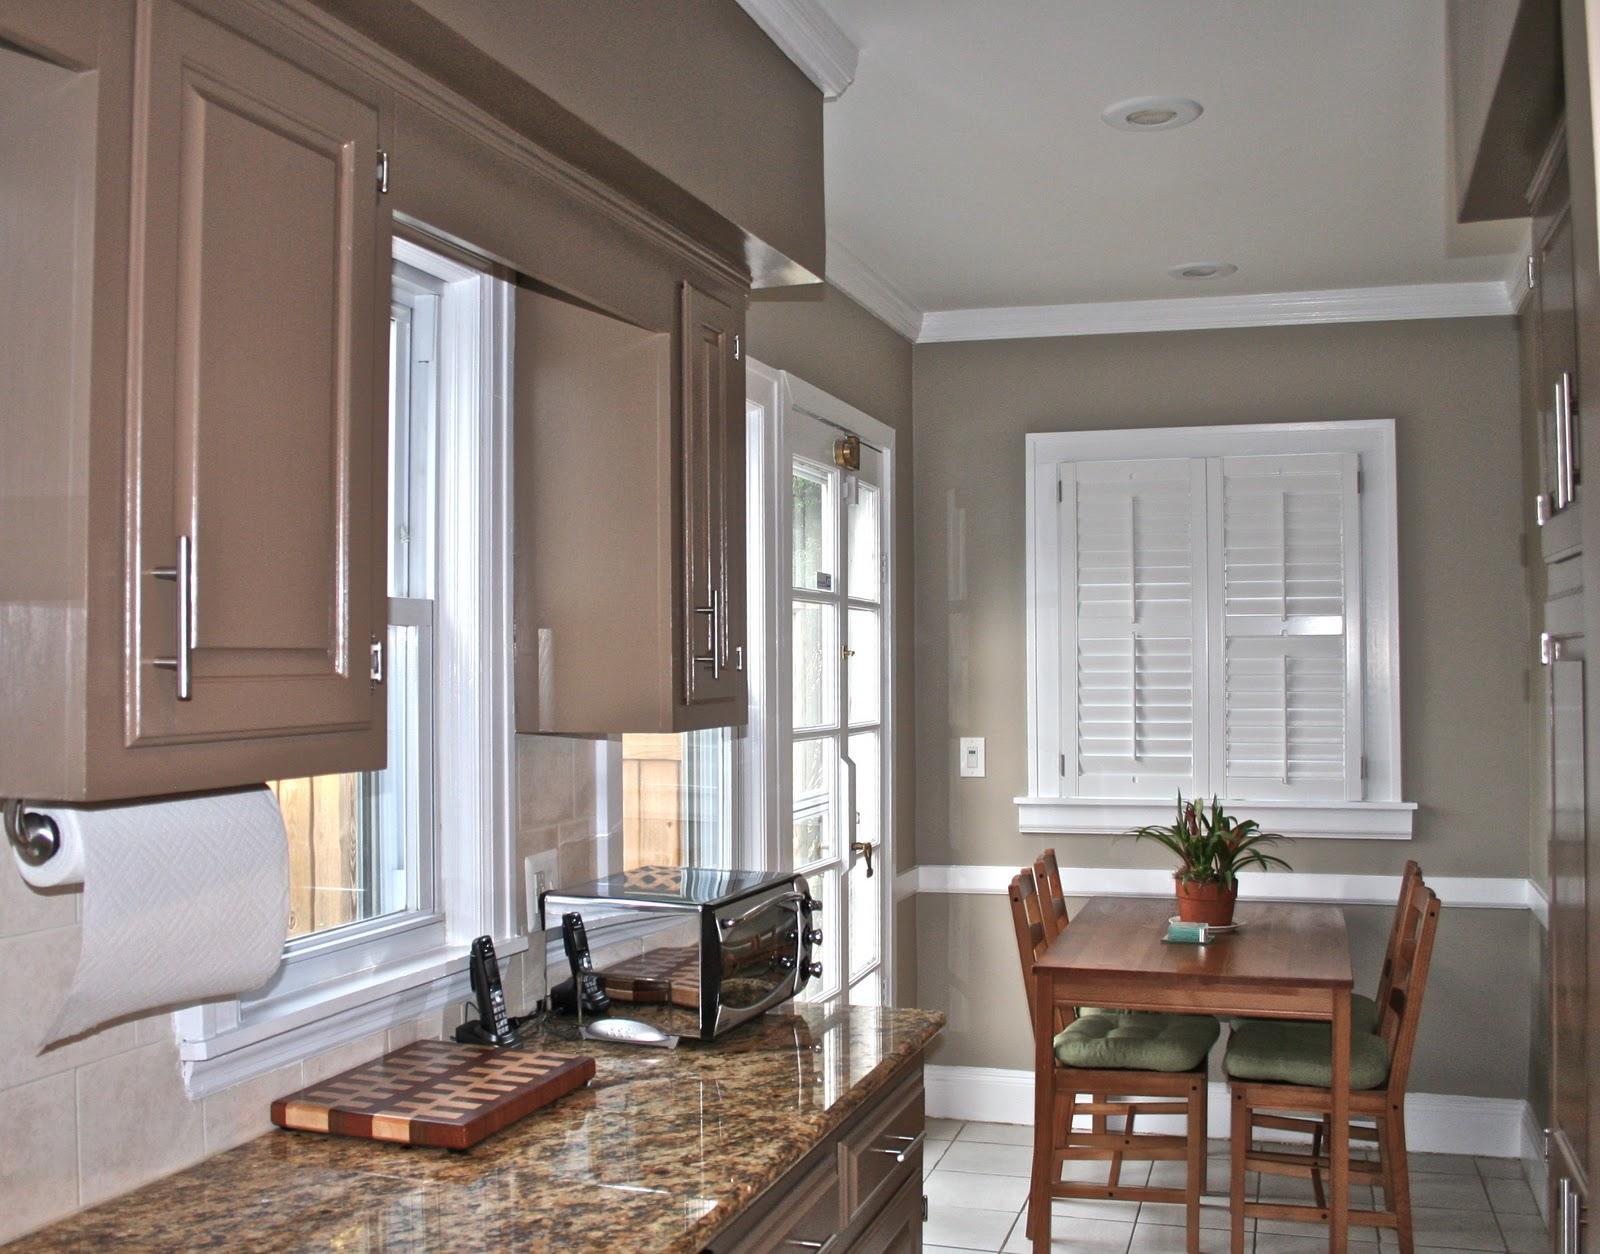 Best Kitchen Gallery: Color Forte Benjamin Moore Paint Color Consultation With Thunder Af 685 of Benjamin Moore Sea Haze Kitchen Cabinets on rachelxblog.com